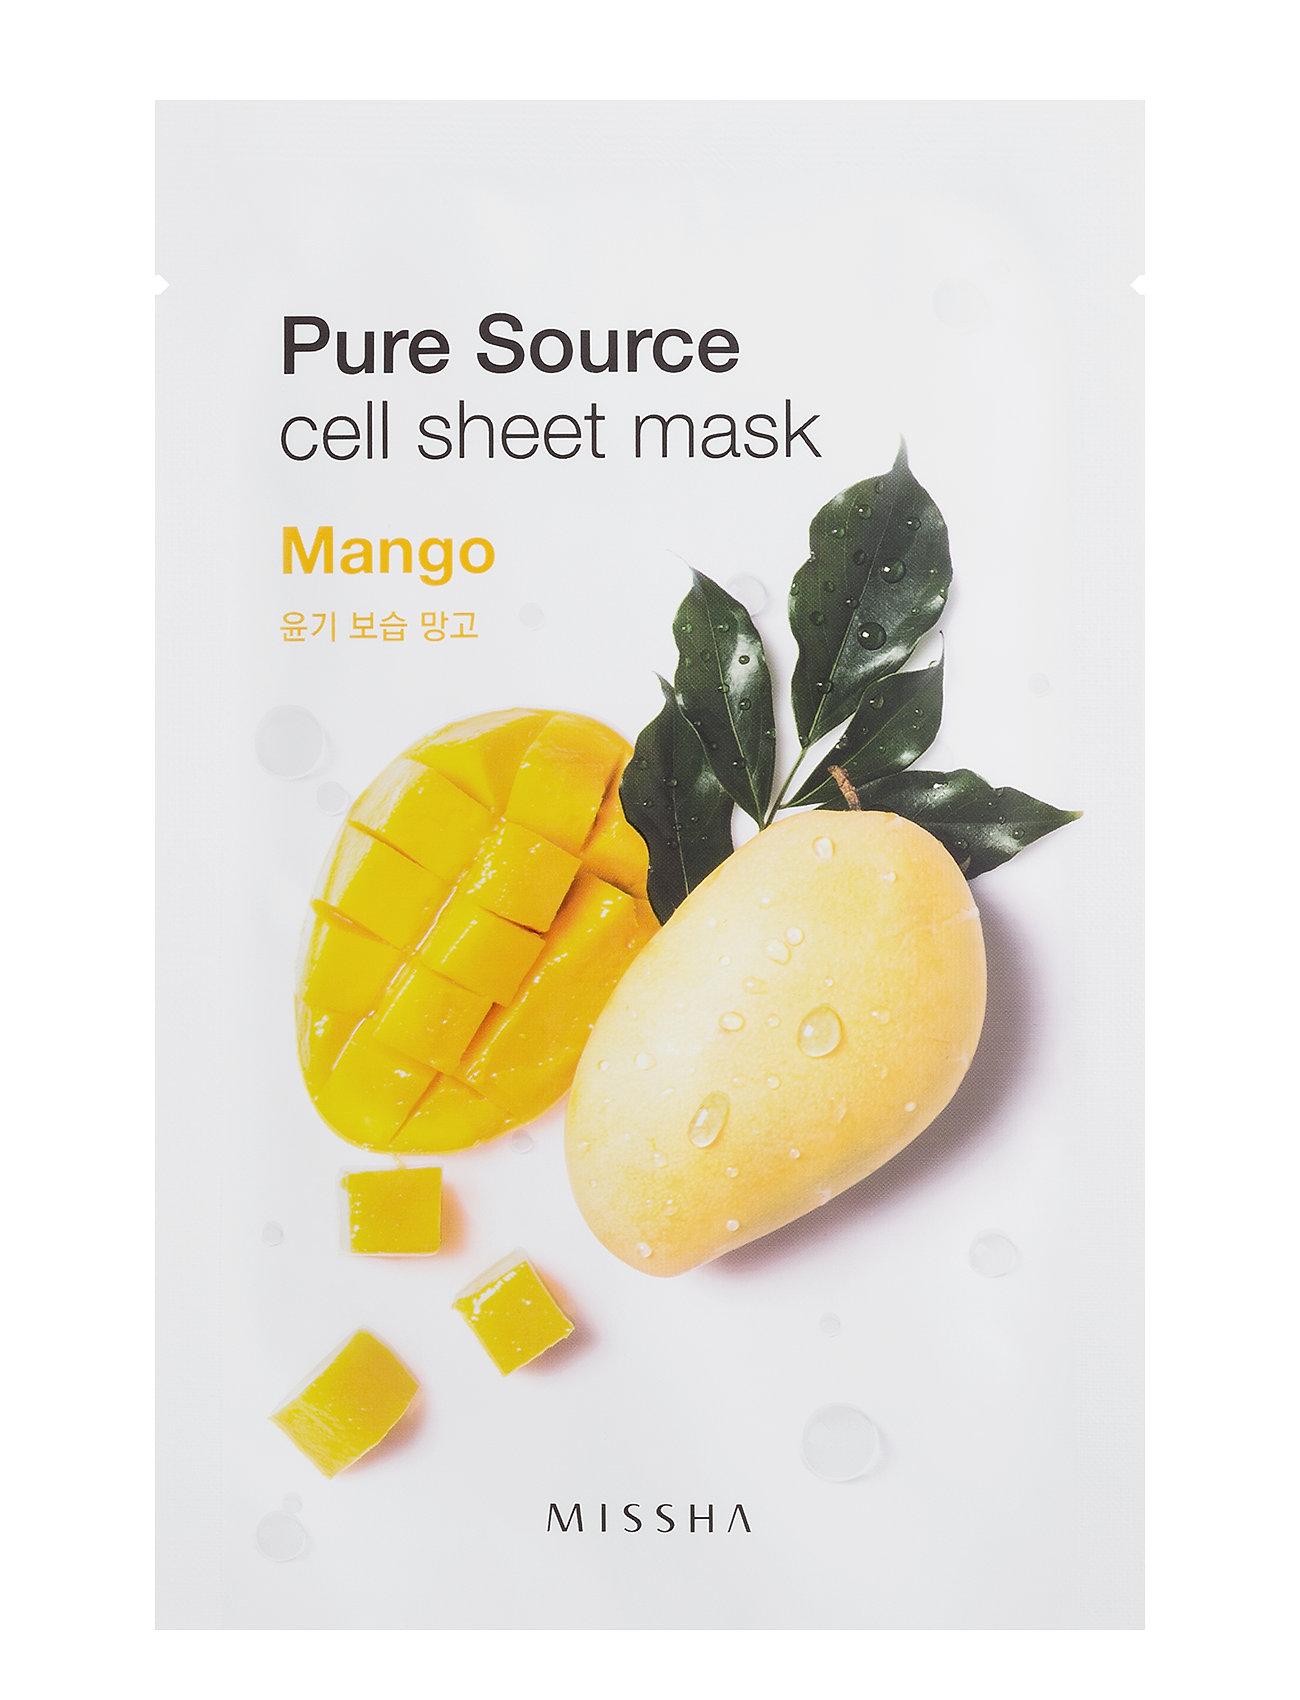 Missha Pure Source Cell Sheet Mask (Mango) - Missha